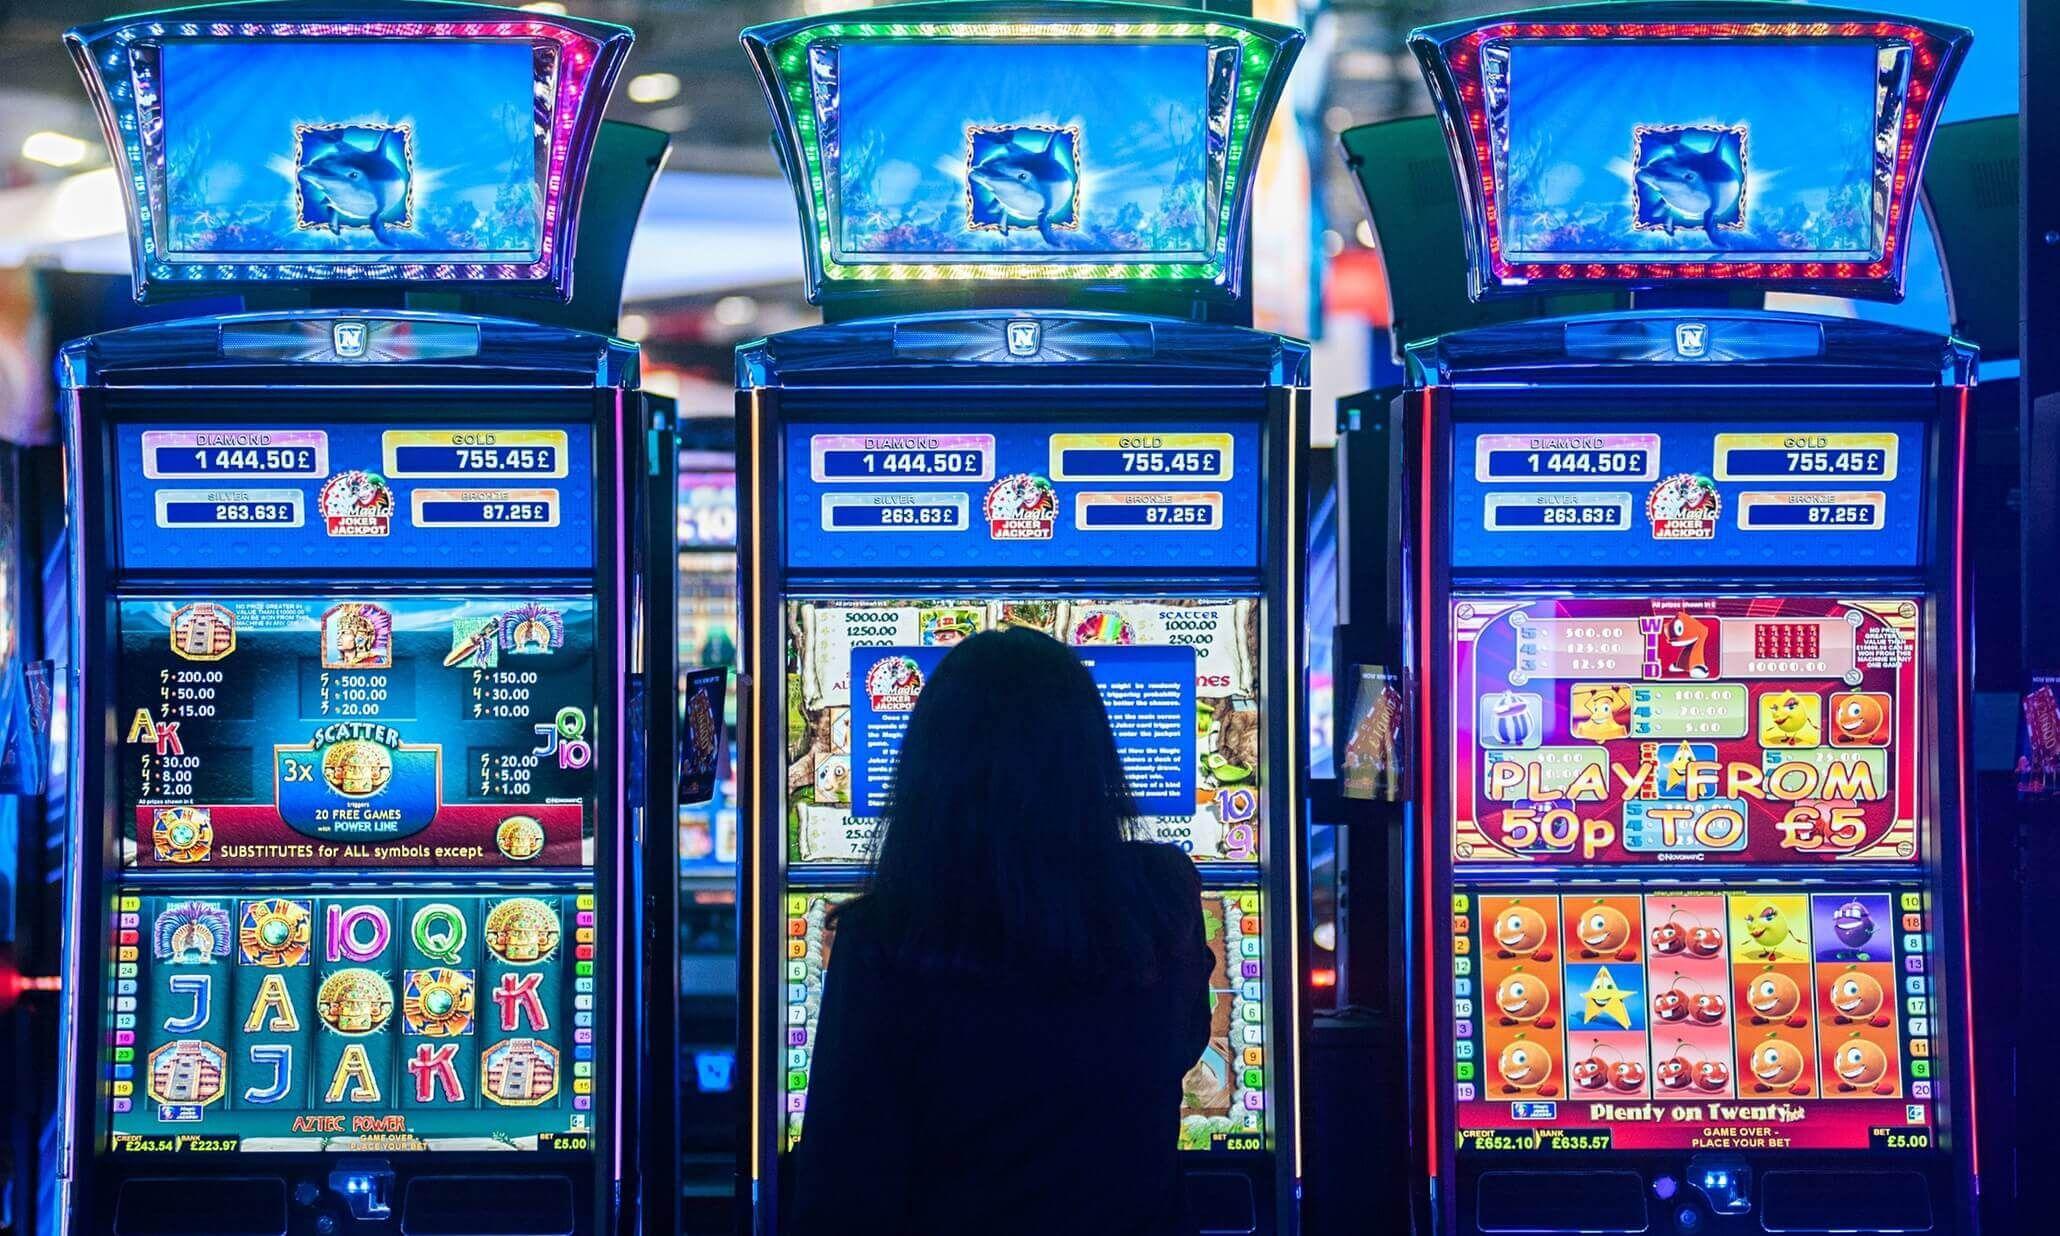 Онлайн казино с 10 при регистрации капчагай казино биладжио на работу охрана онлайн